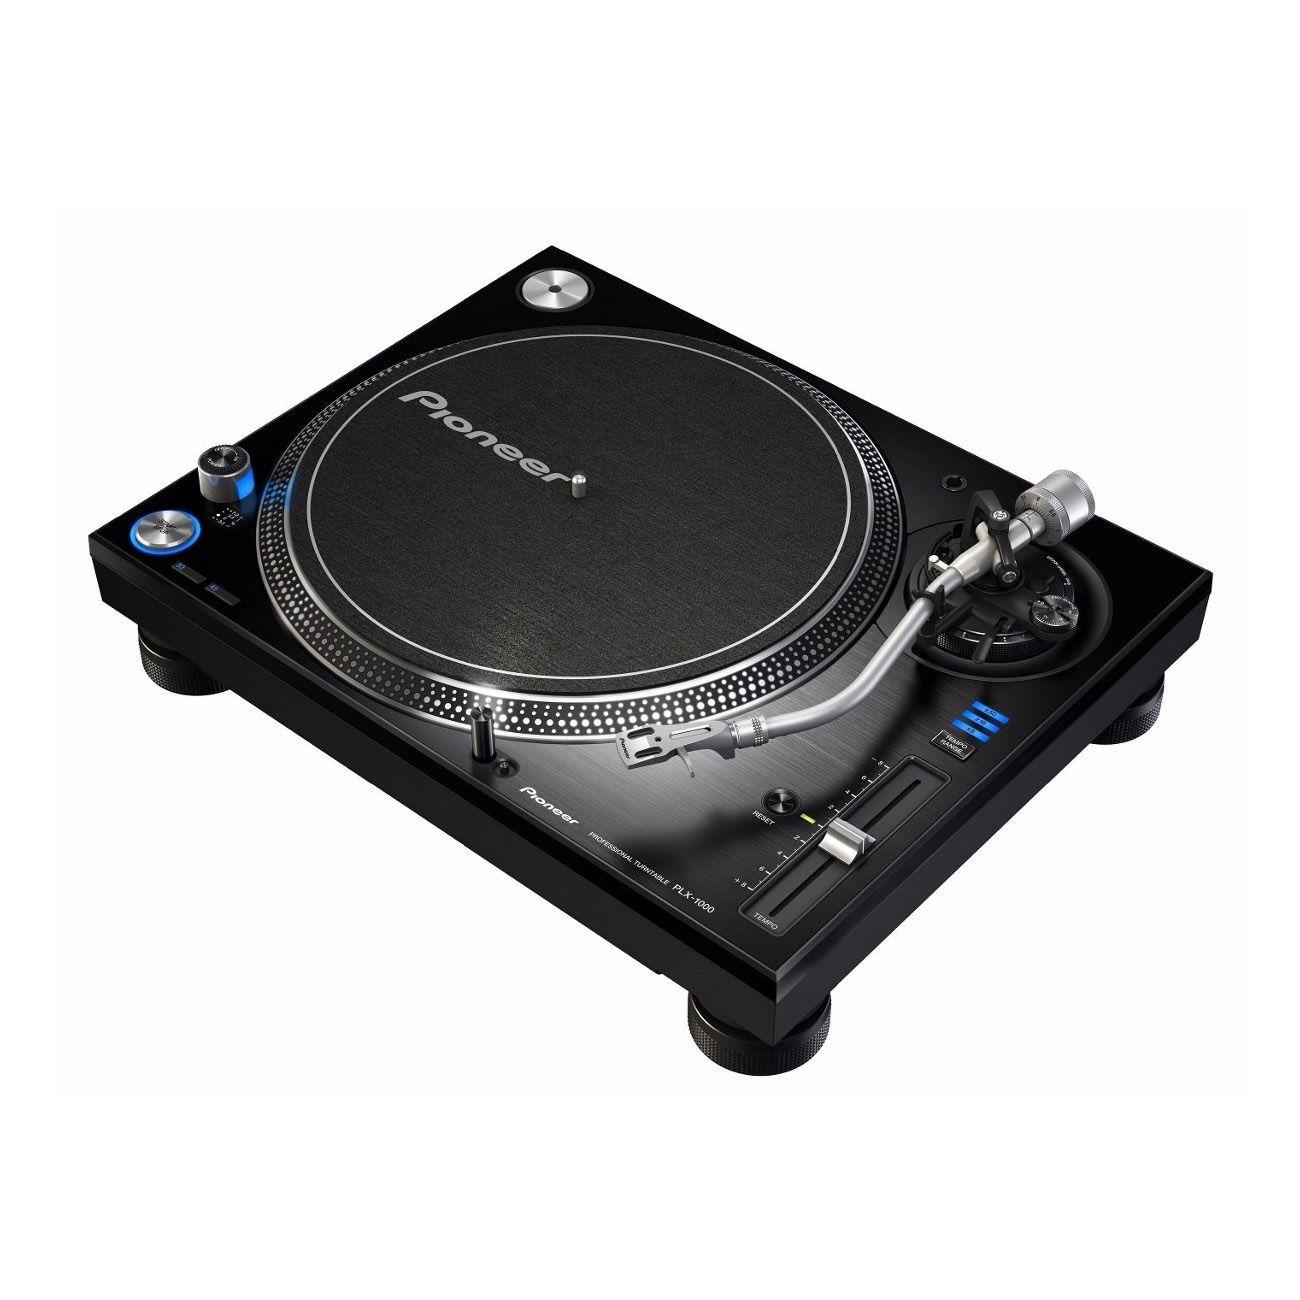 Toca Disco Pioneer Dj Plx 1000 K